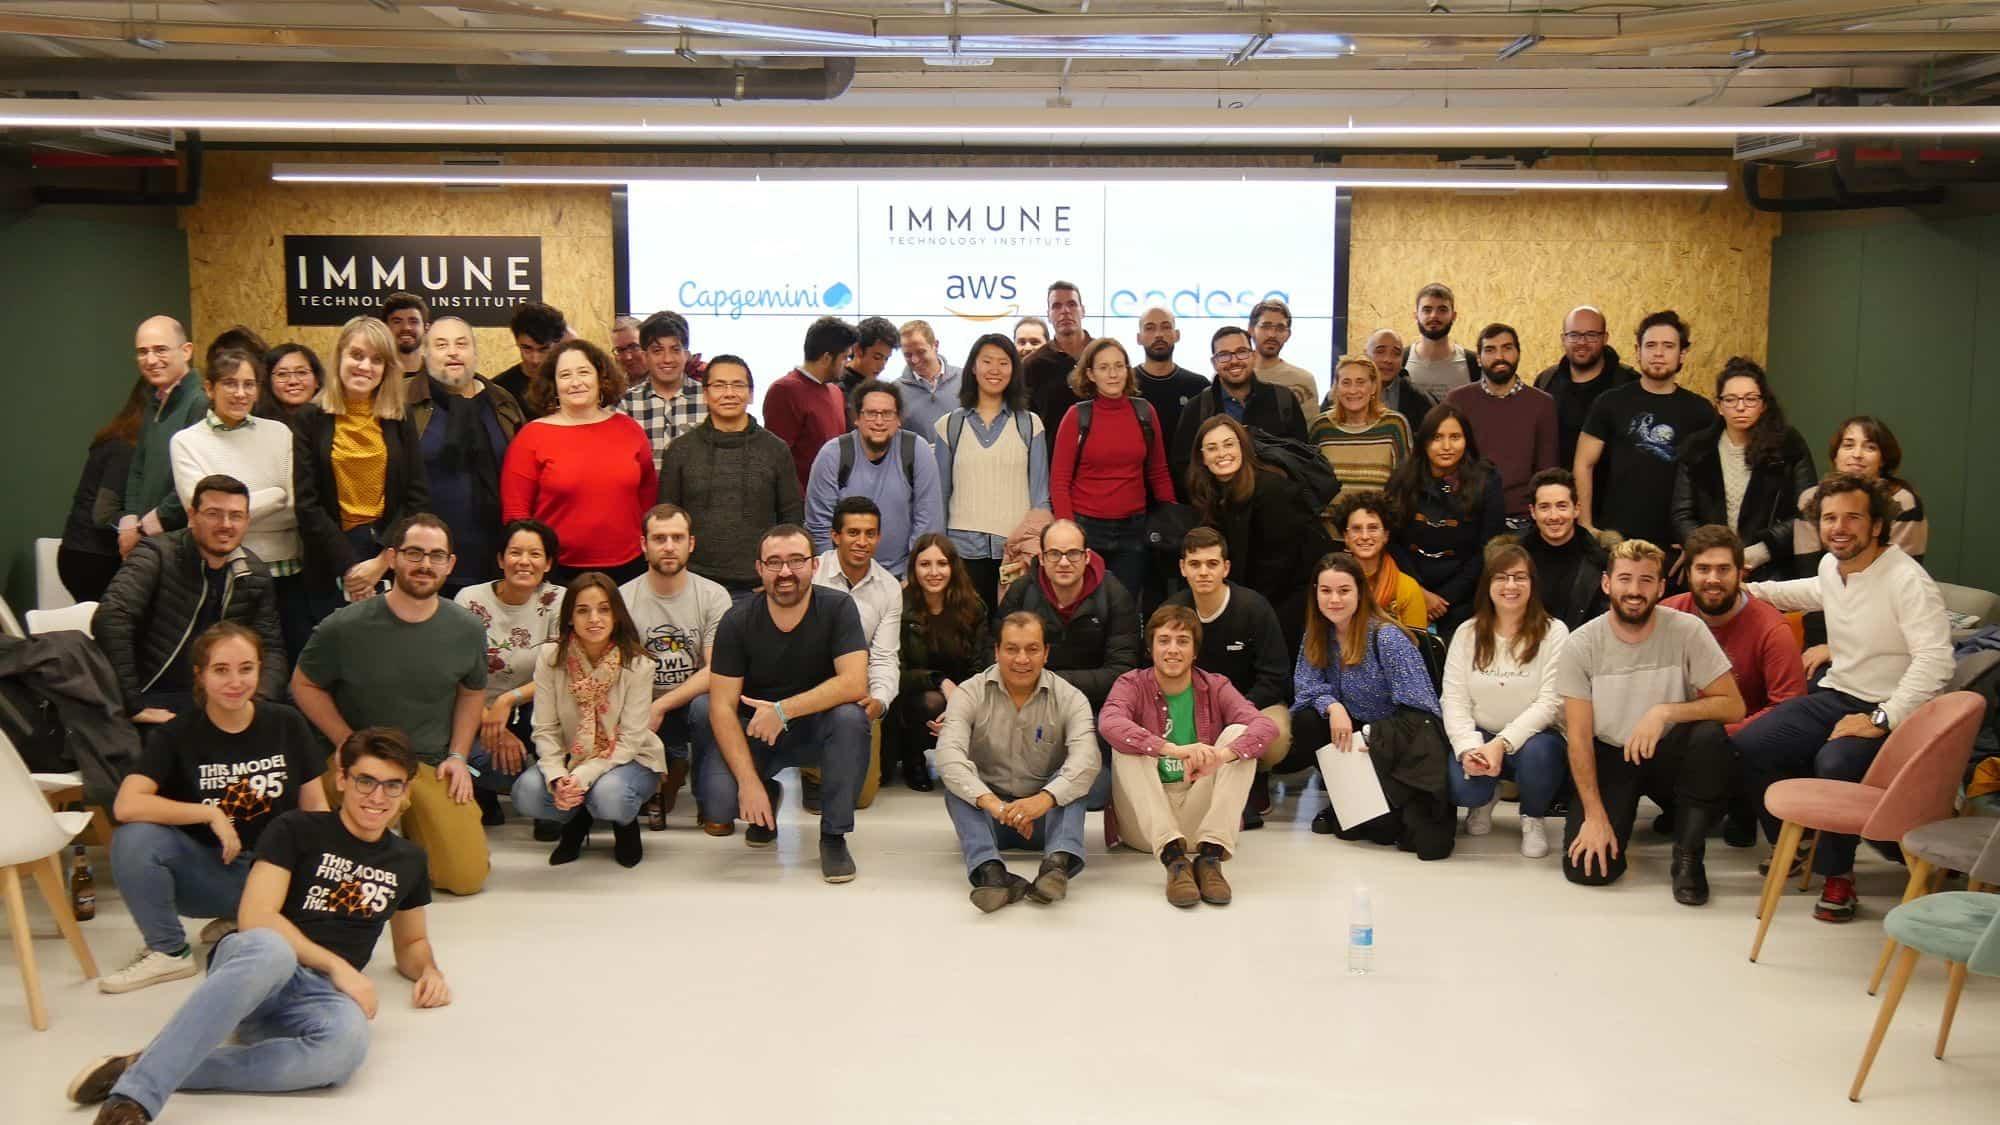 madrid acogera el primer reto de data science auspiciado por immune technology institute